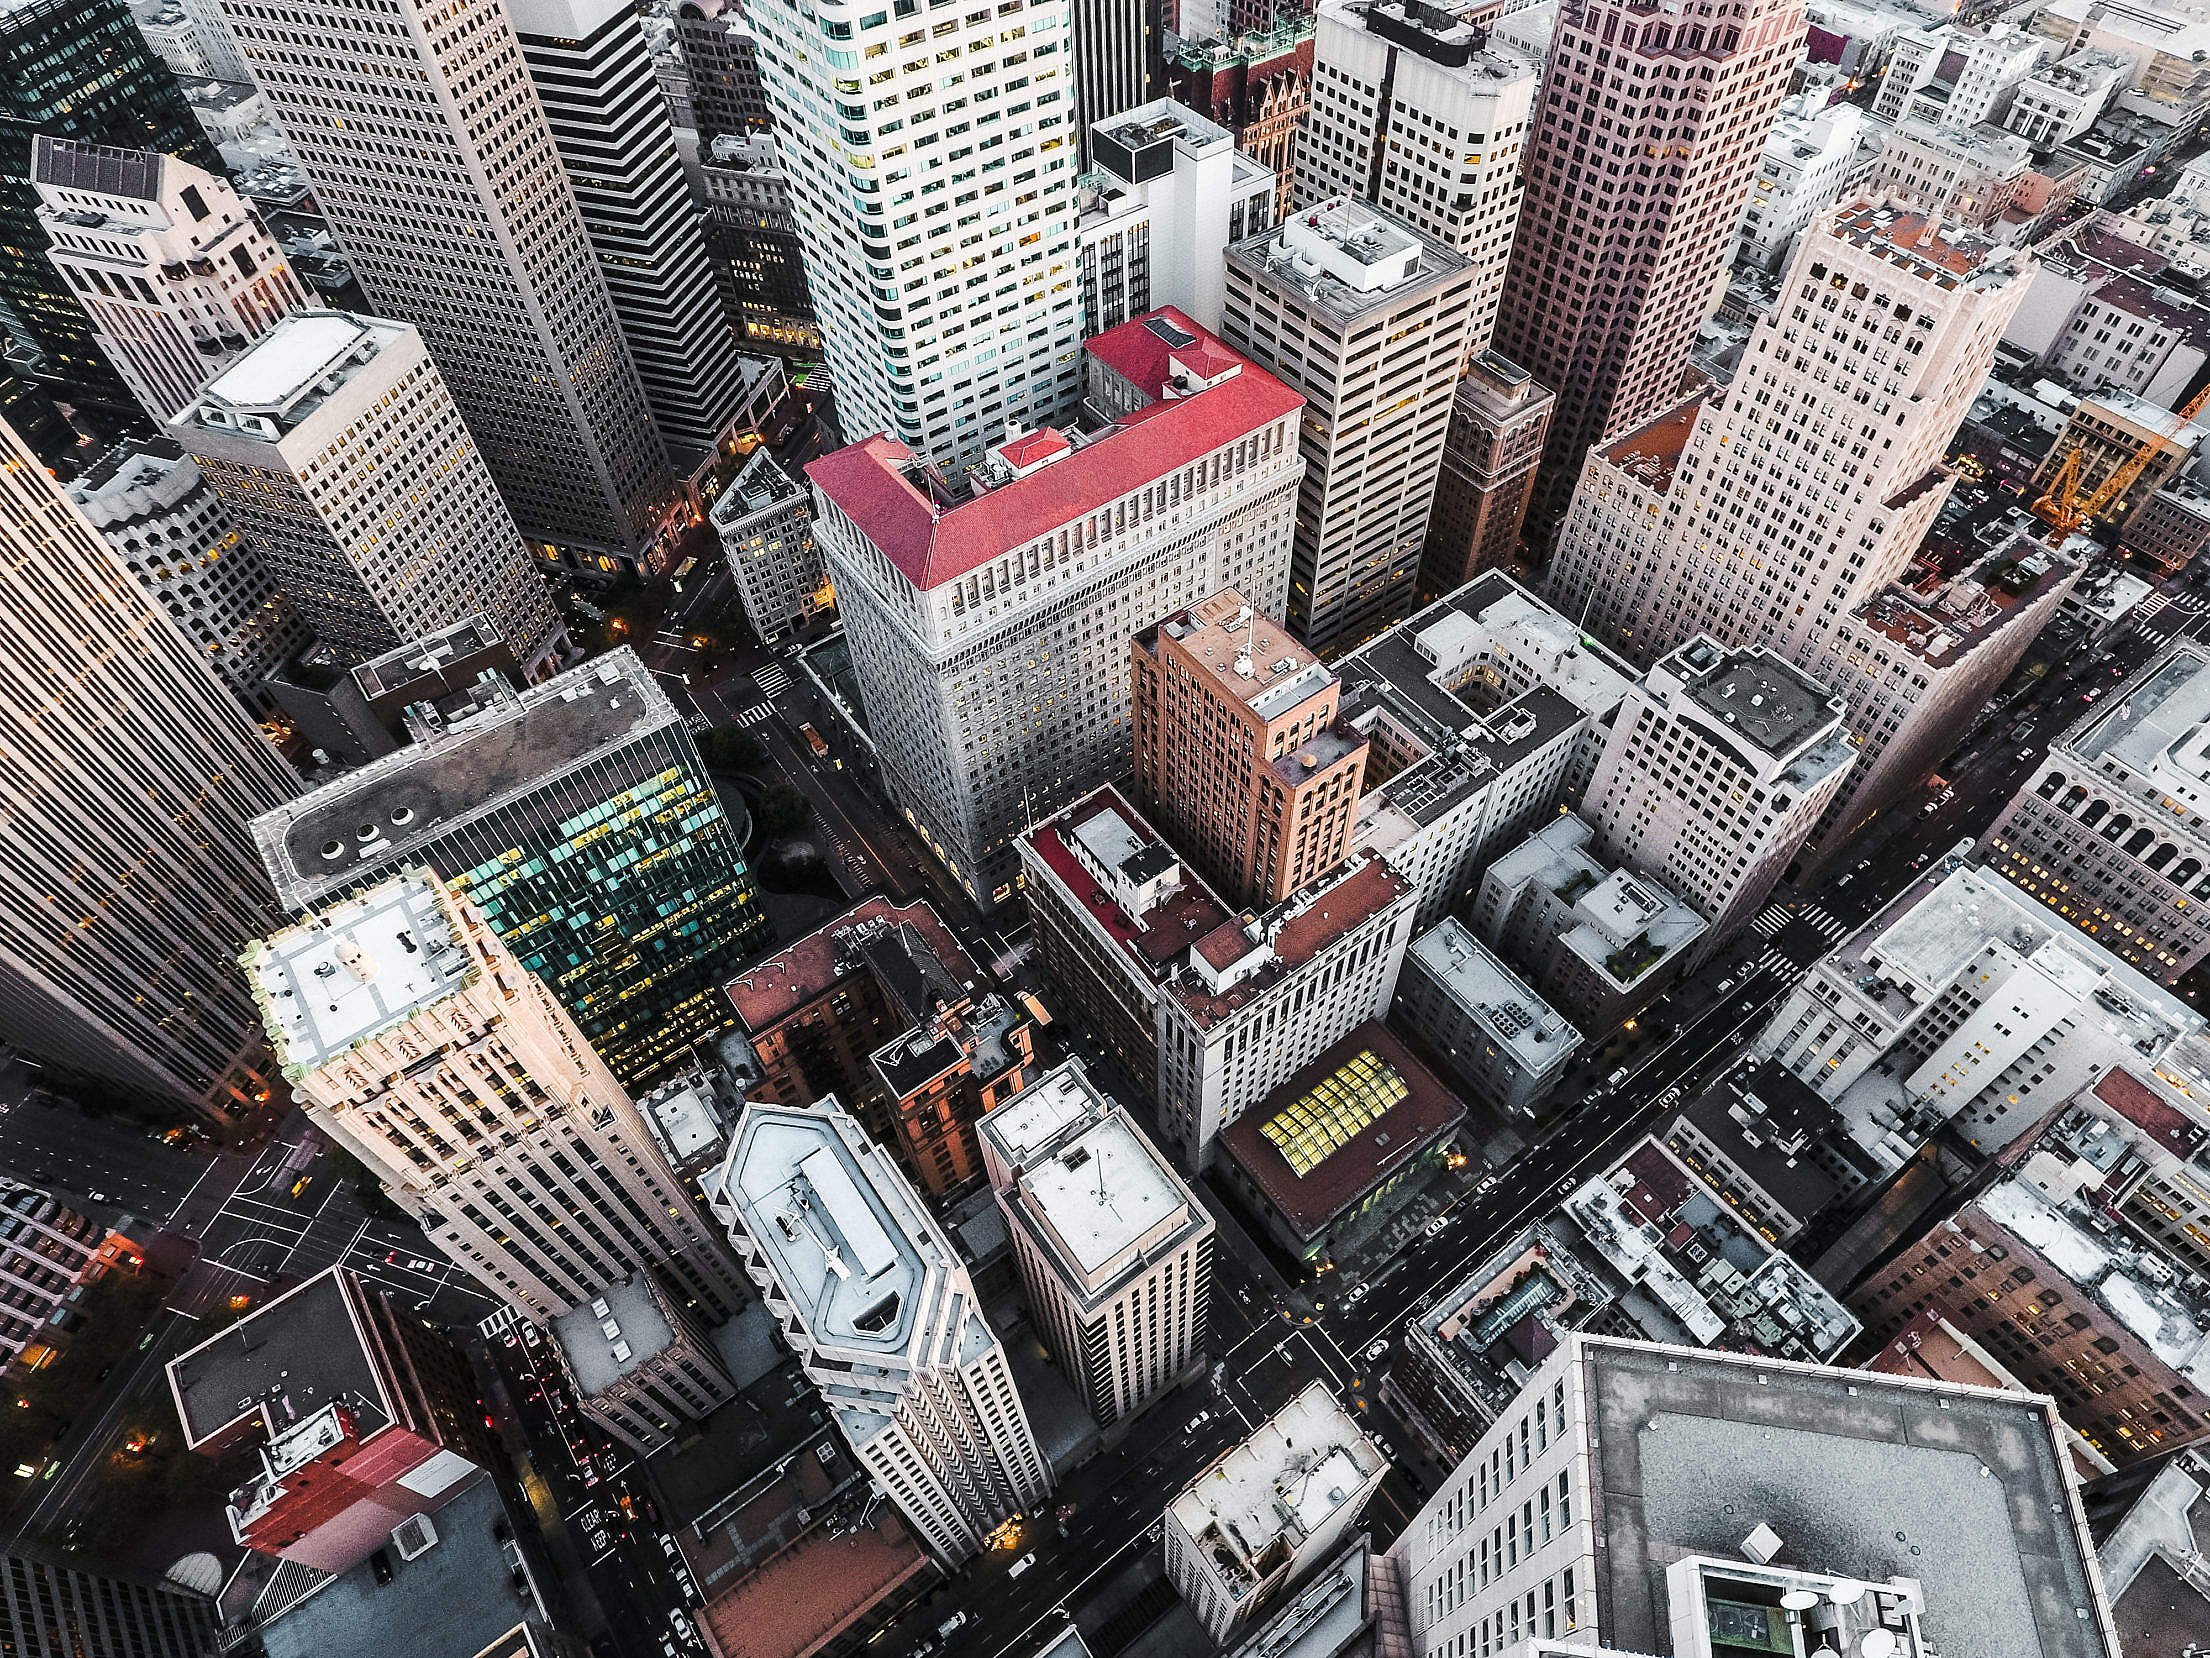 san-francisco-financial-district-skyscrapers.JPG-2210x1658[1].jpg